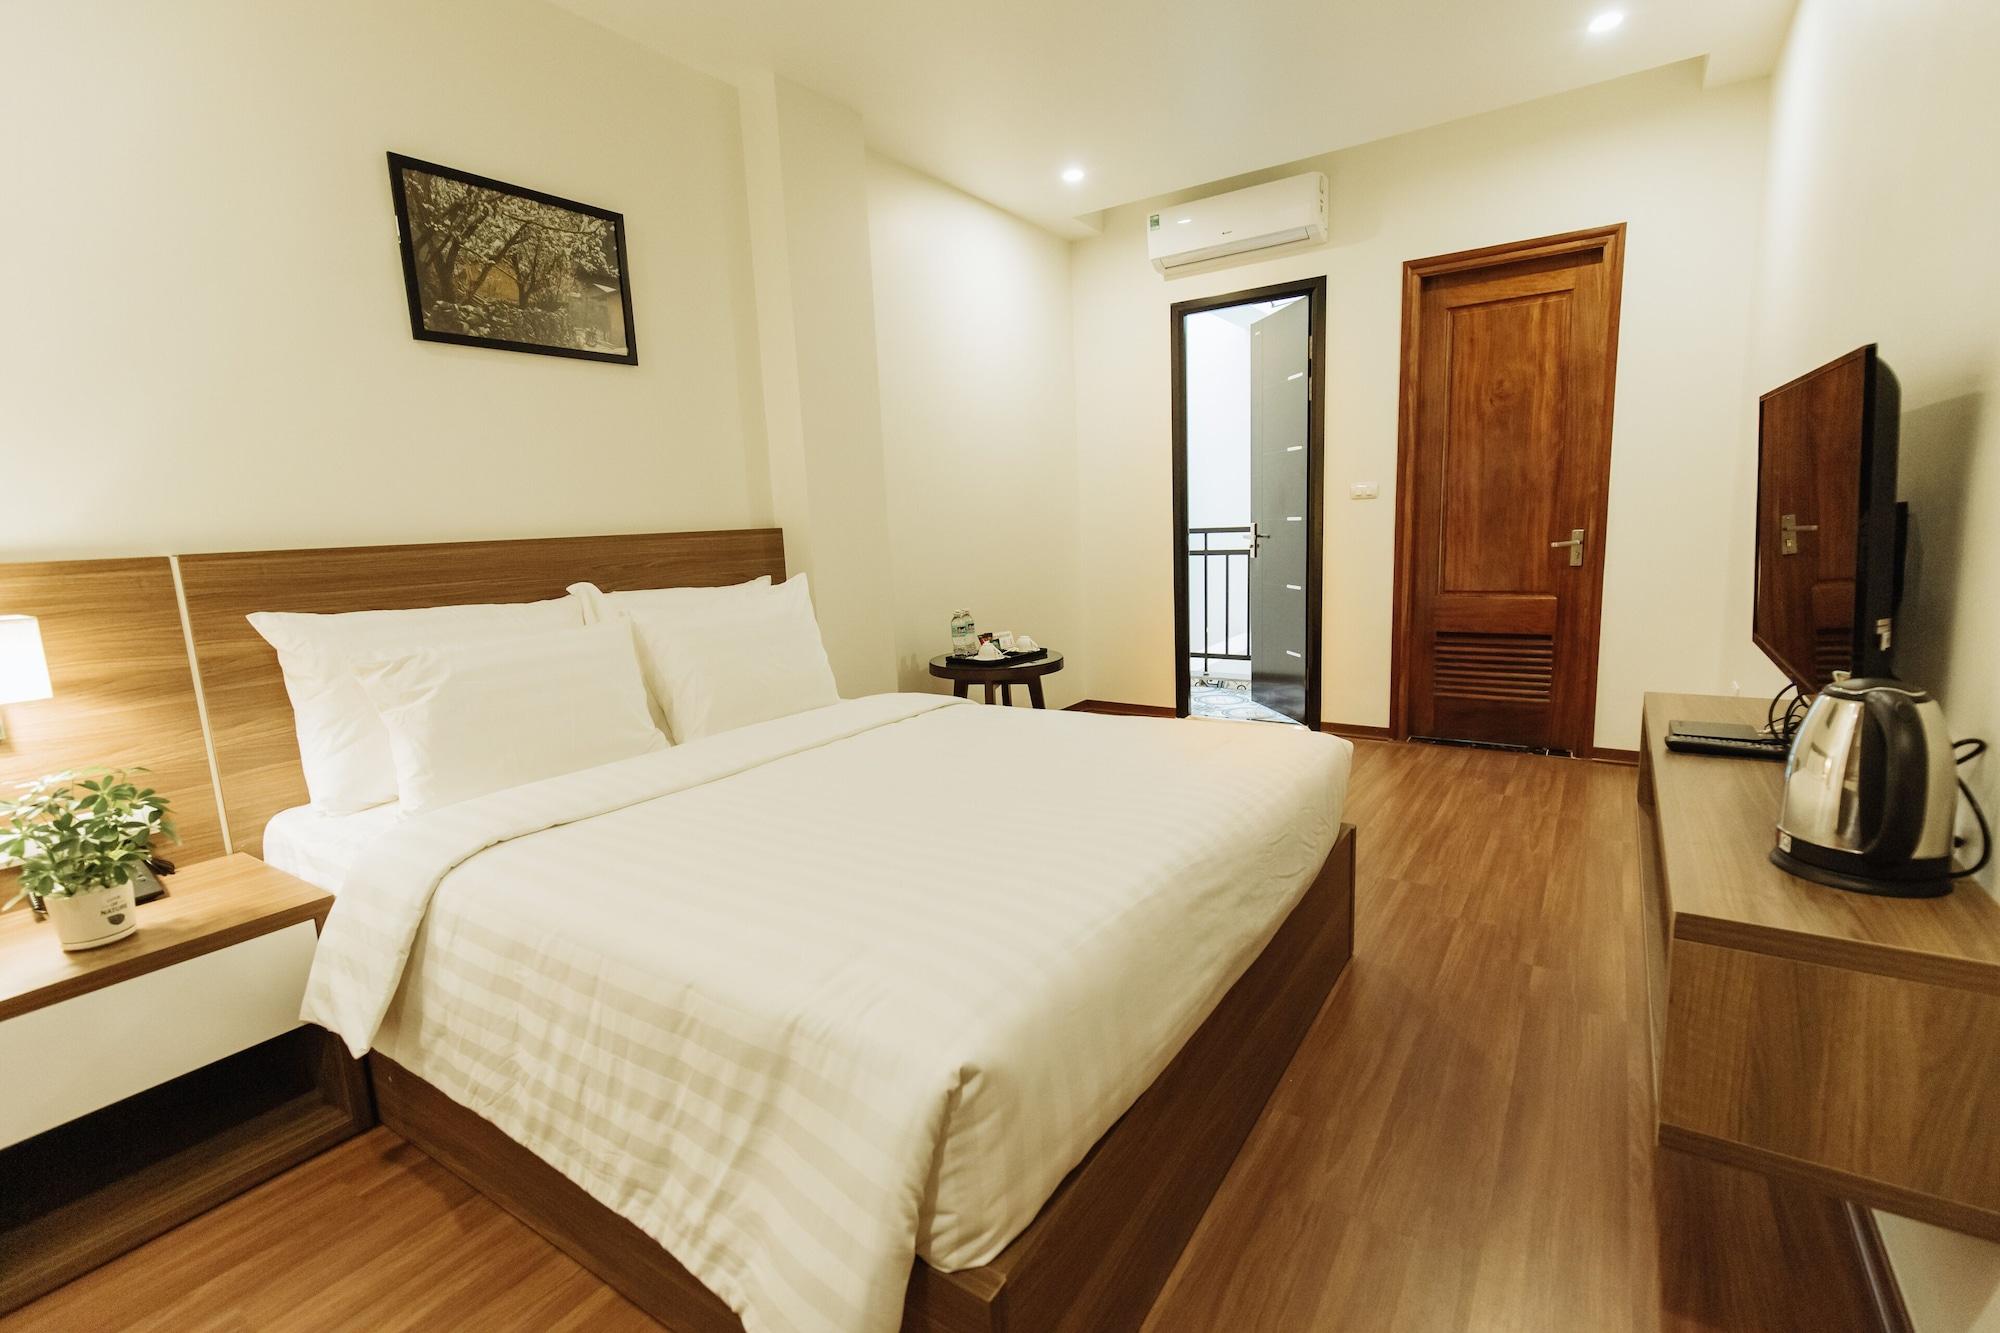 Paragon House & Residence, Sóc Sơn